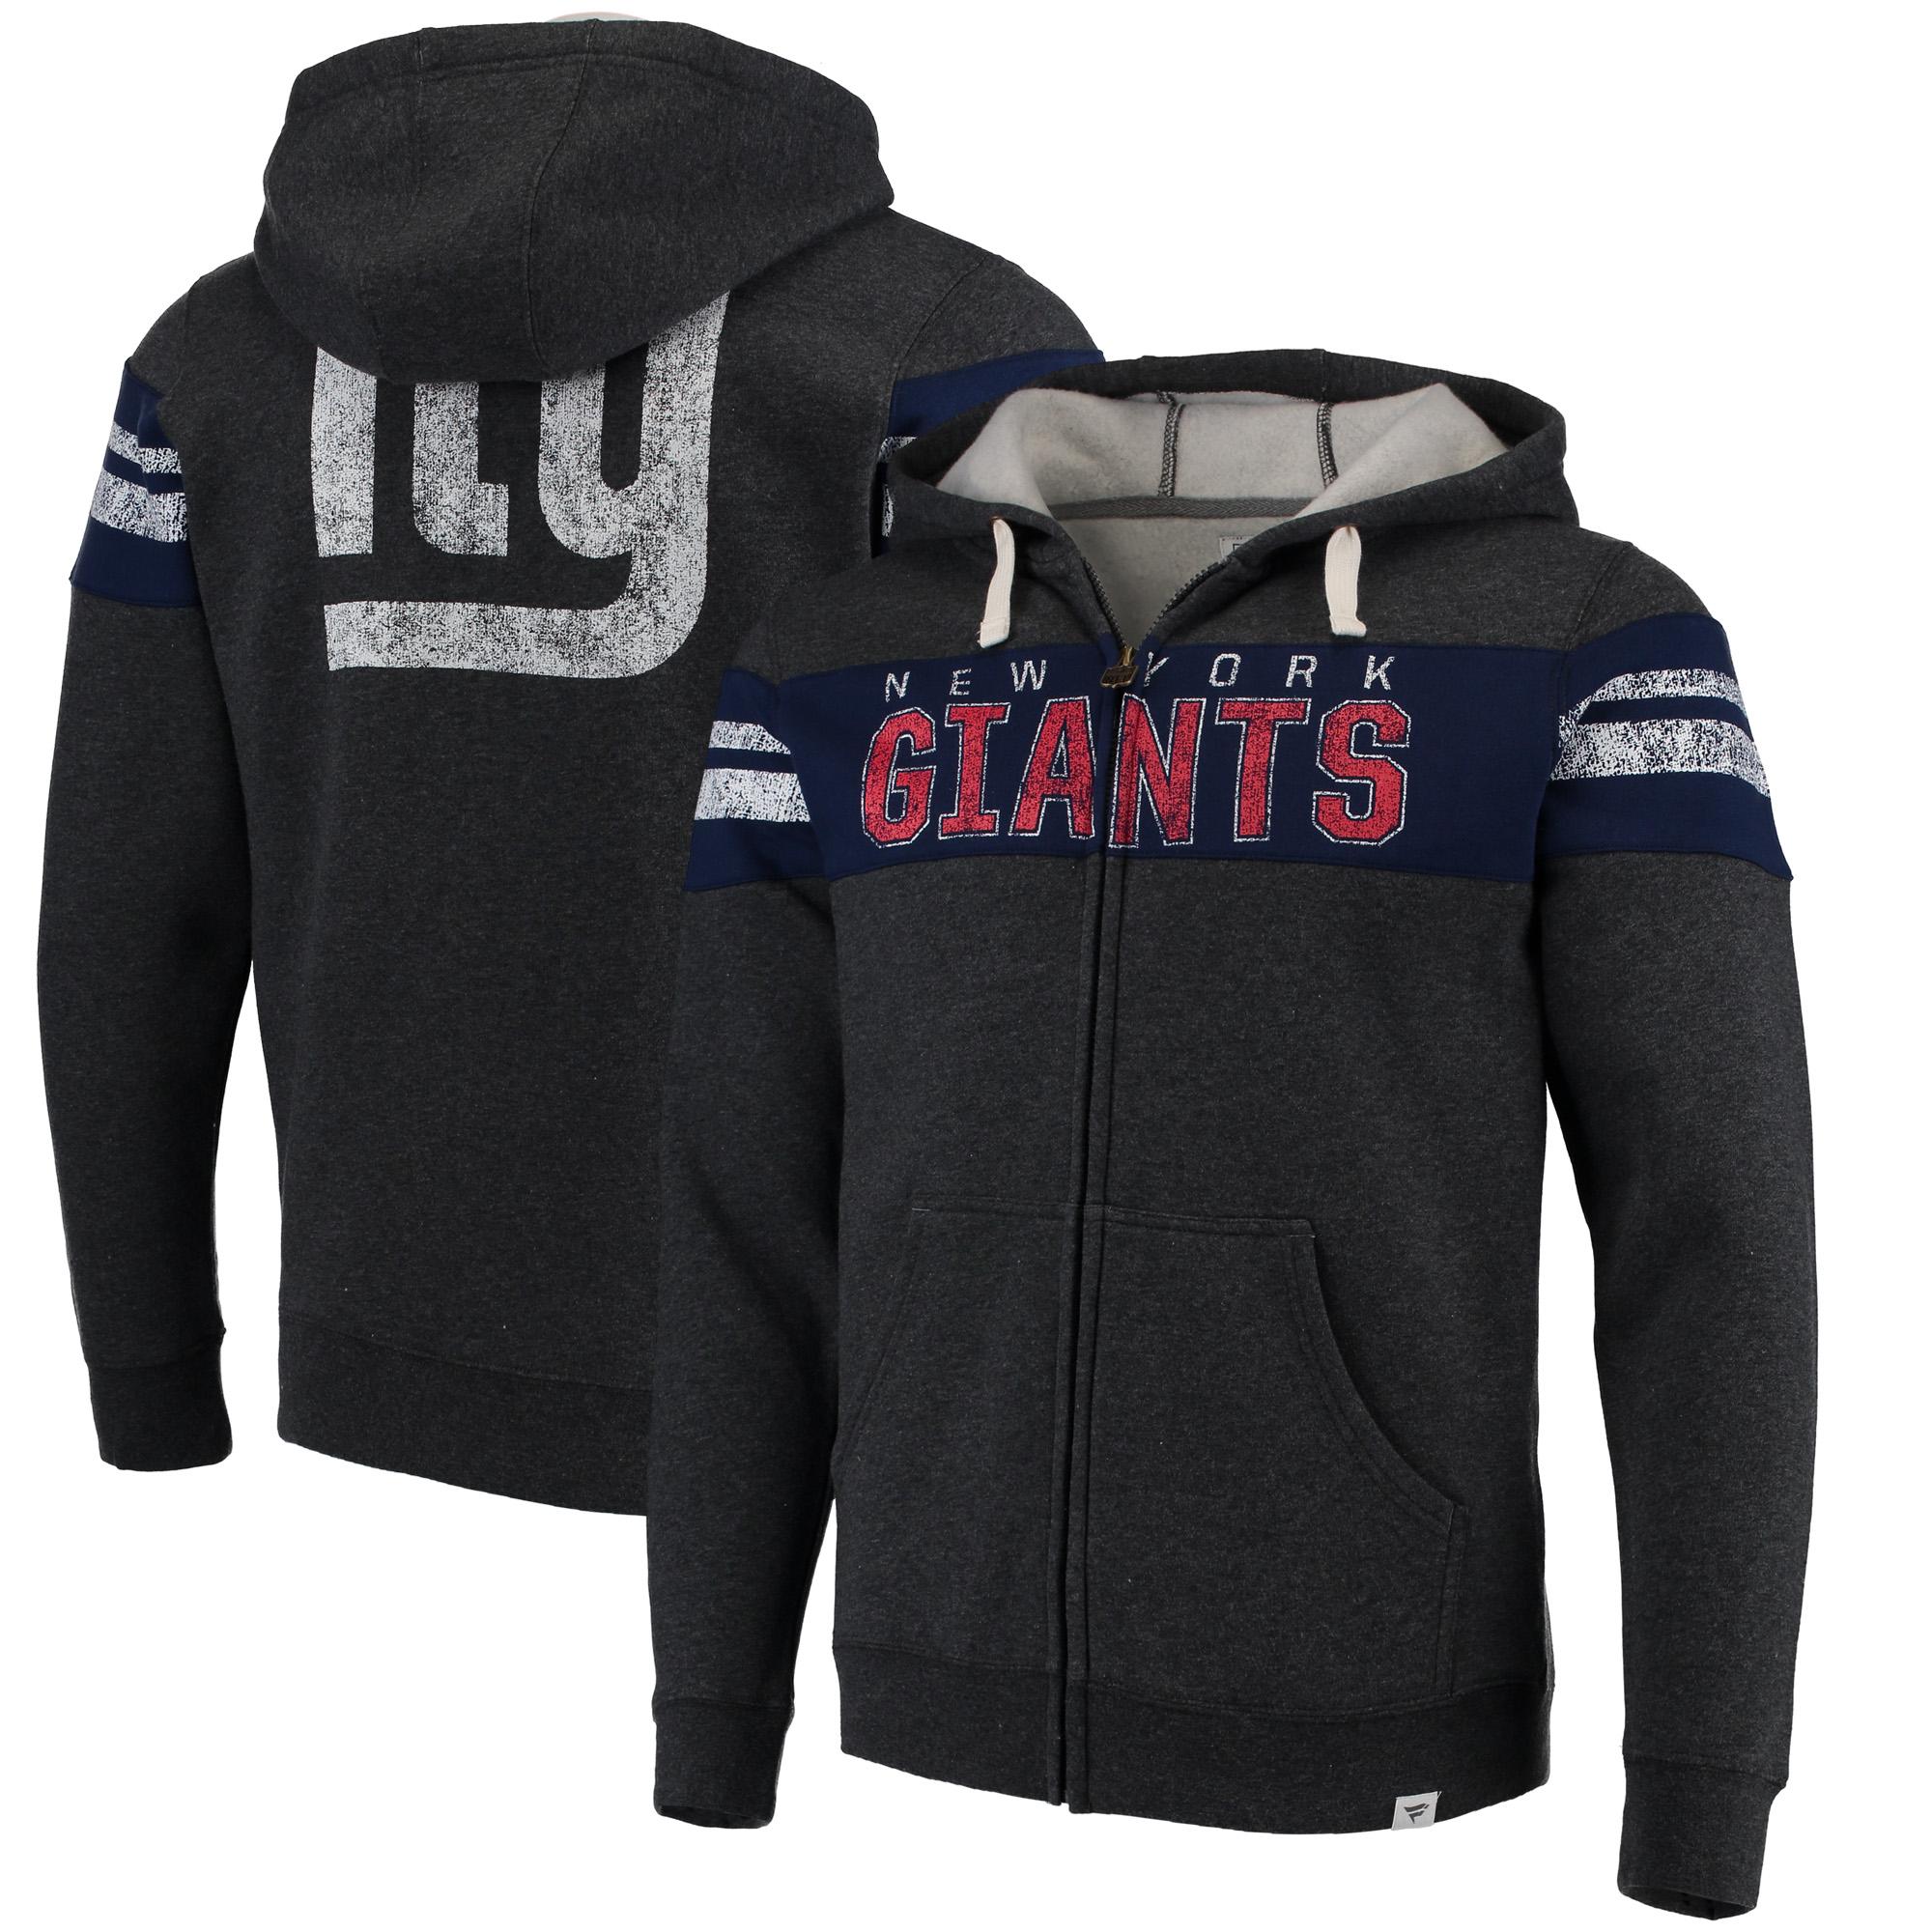 New York Giants NFL Pro Line by Fanatics Branded True Classics Throwback Full-Zip Hoodie - Heathered Gray